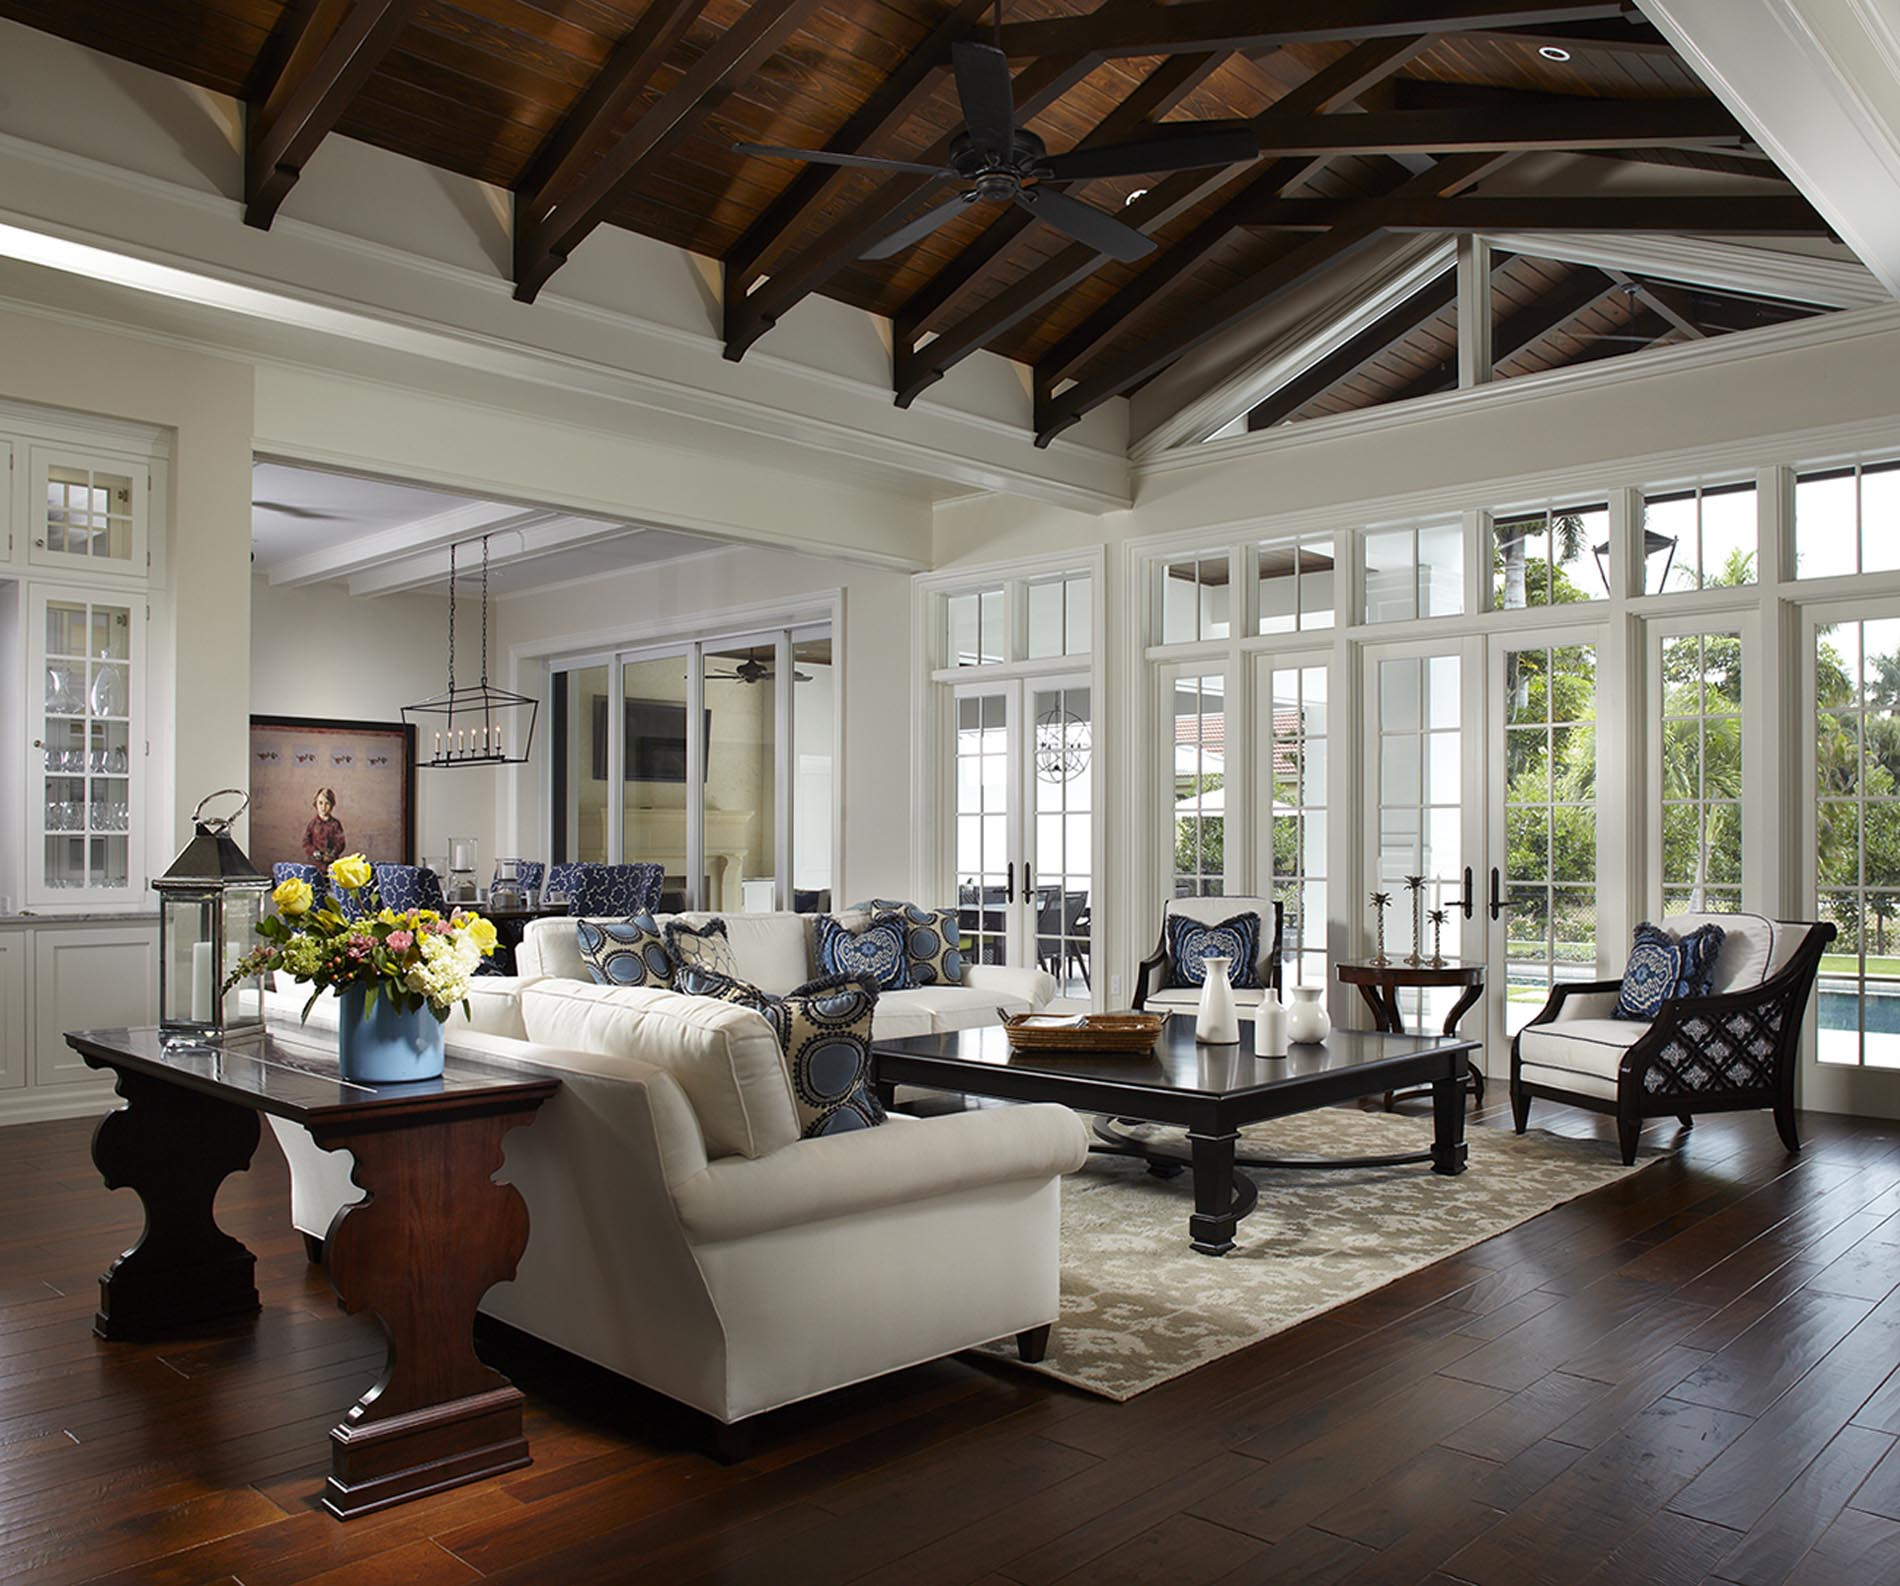 Interior Design Studio: FreeStyle Interior Design Studio & Why You Should Be